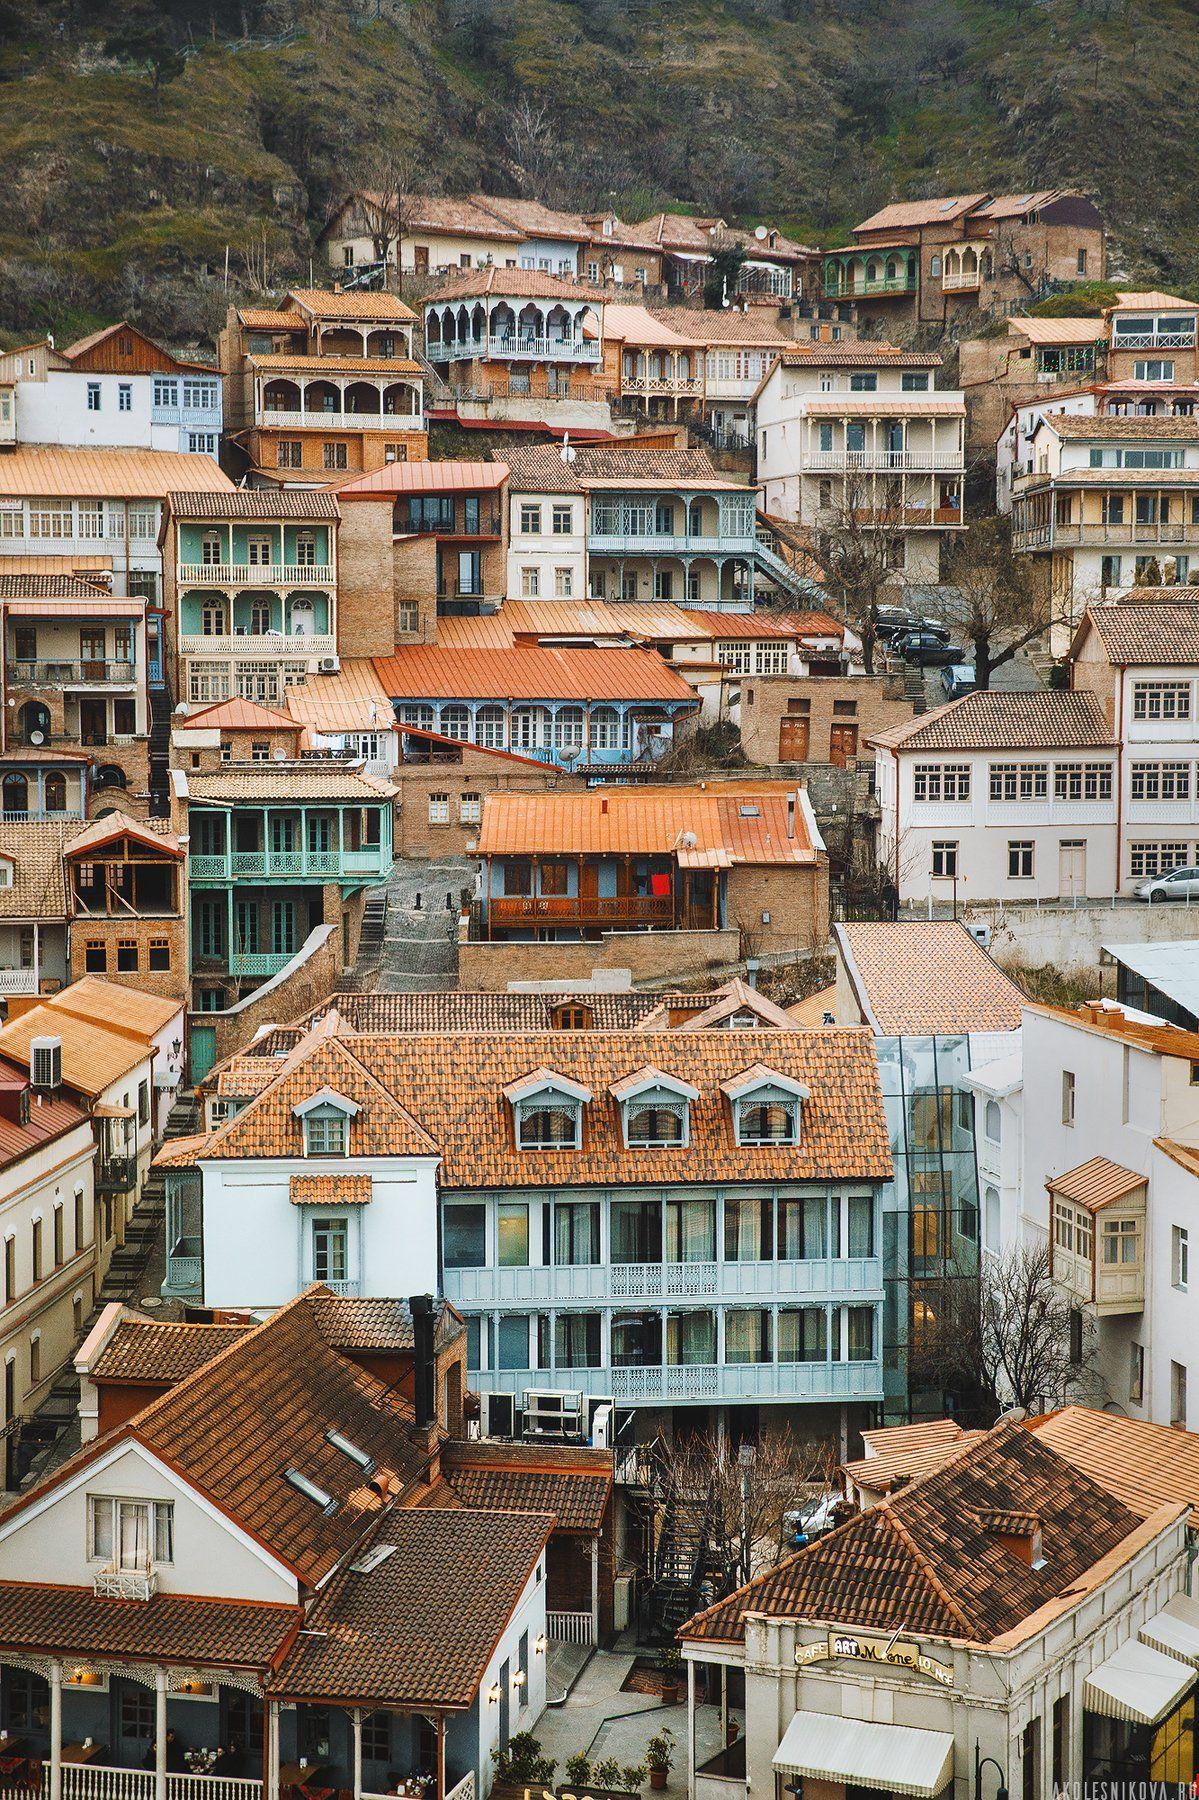 город, архитектура, путешествие, грузия, тбилиси, ритм, Анастасия Колесникова